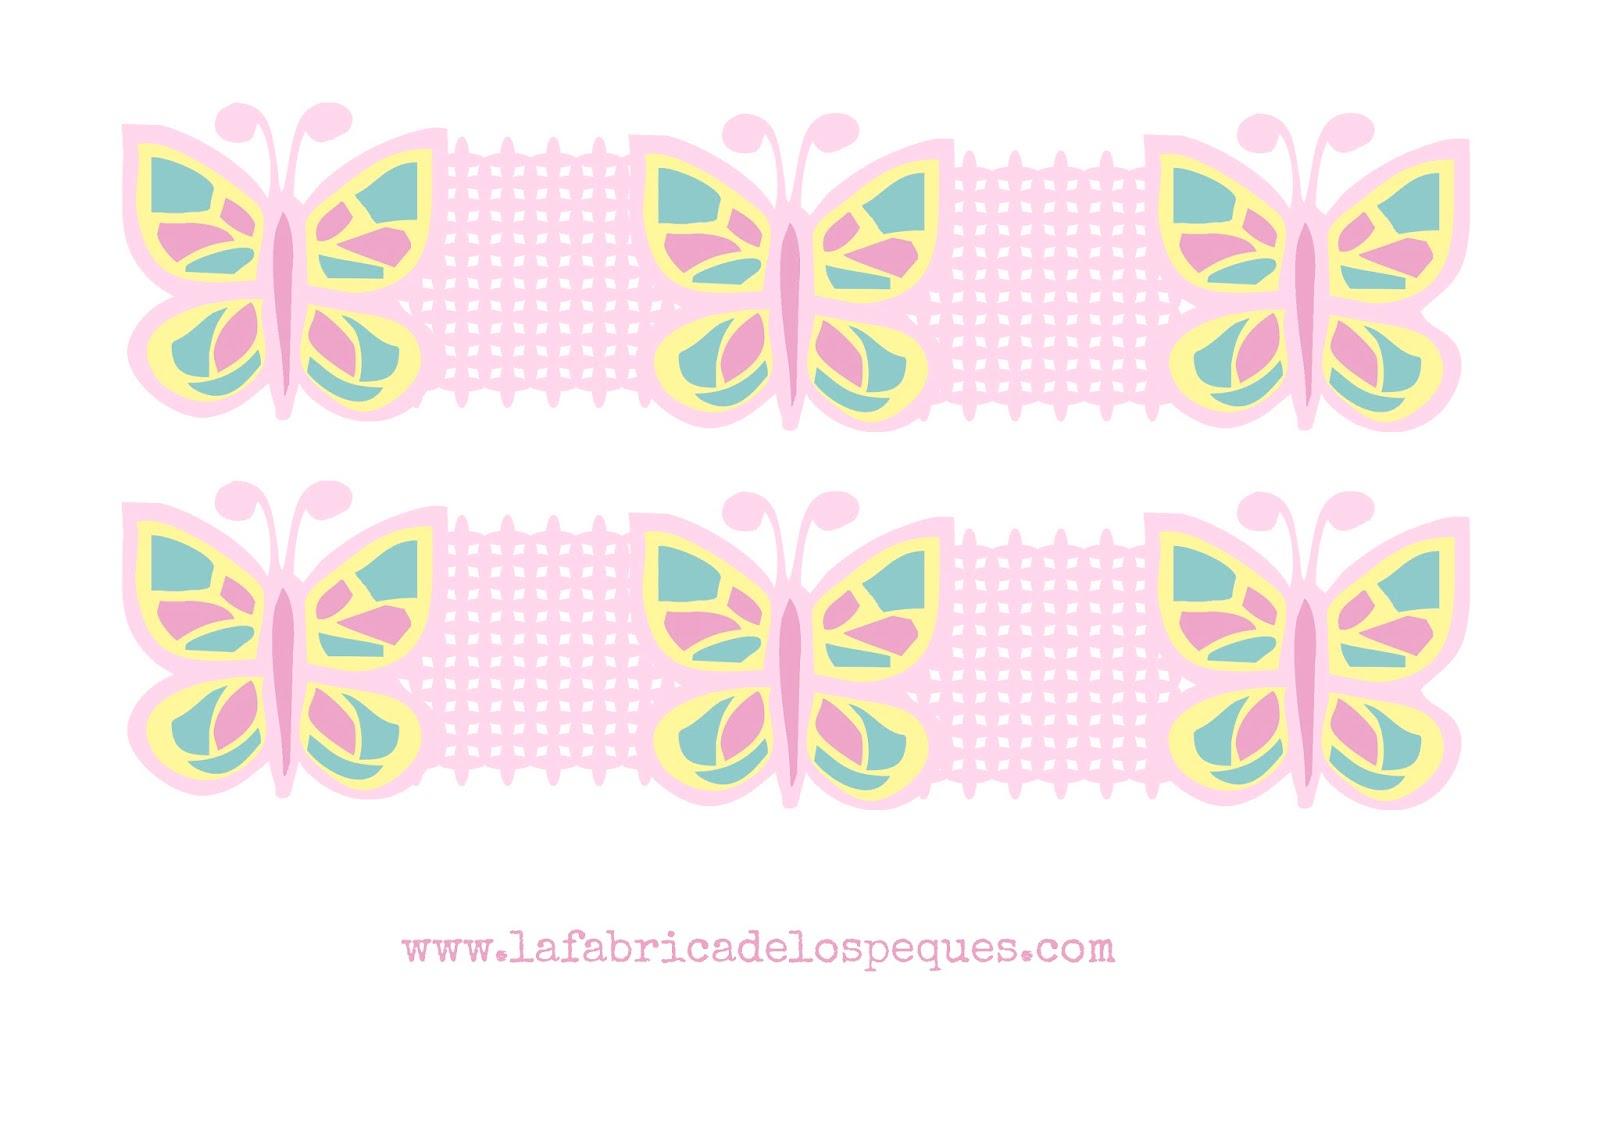 Imprimibles y moldes gratis cenefas infantiles para decorar - Cenefas para dibujar ...